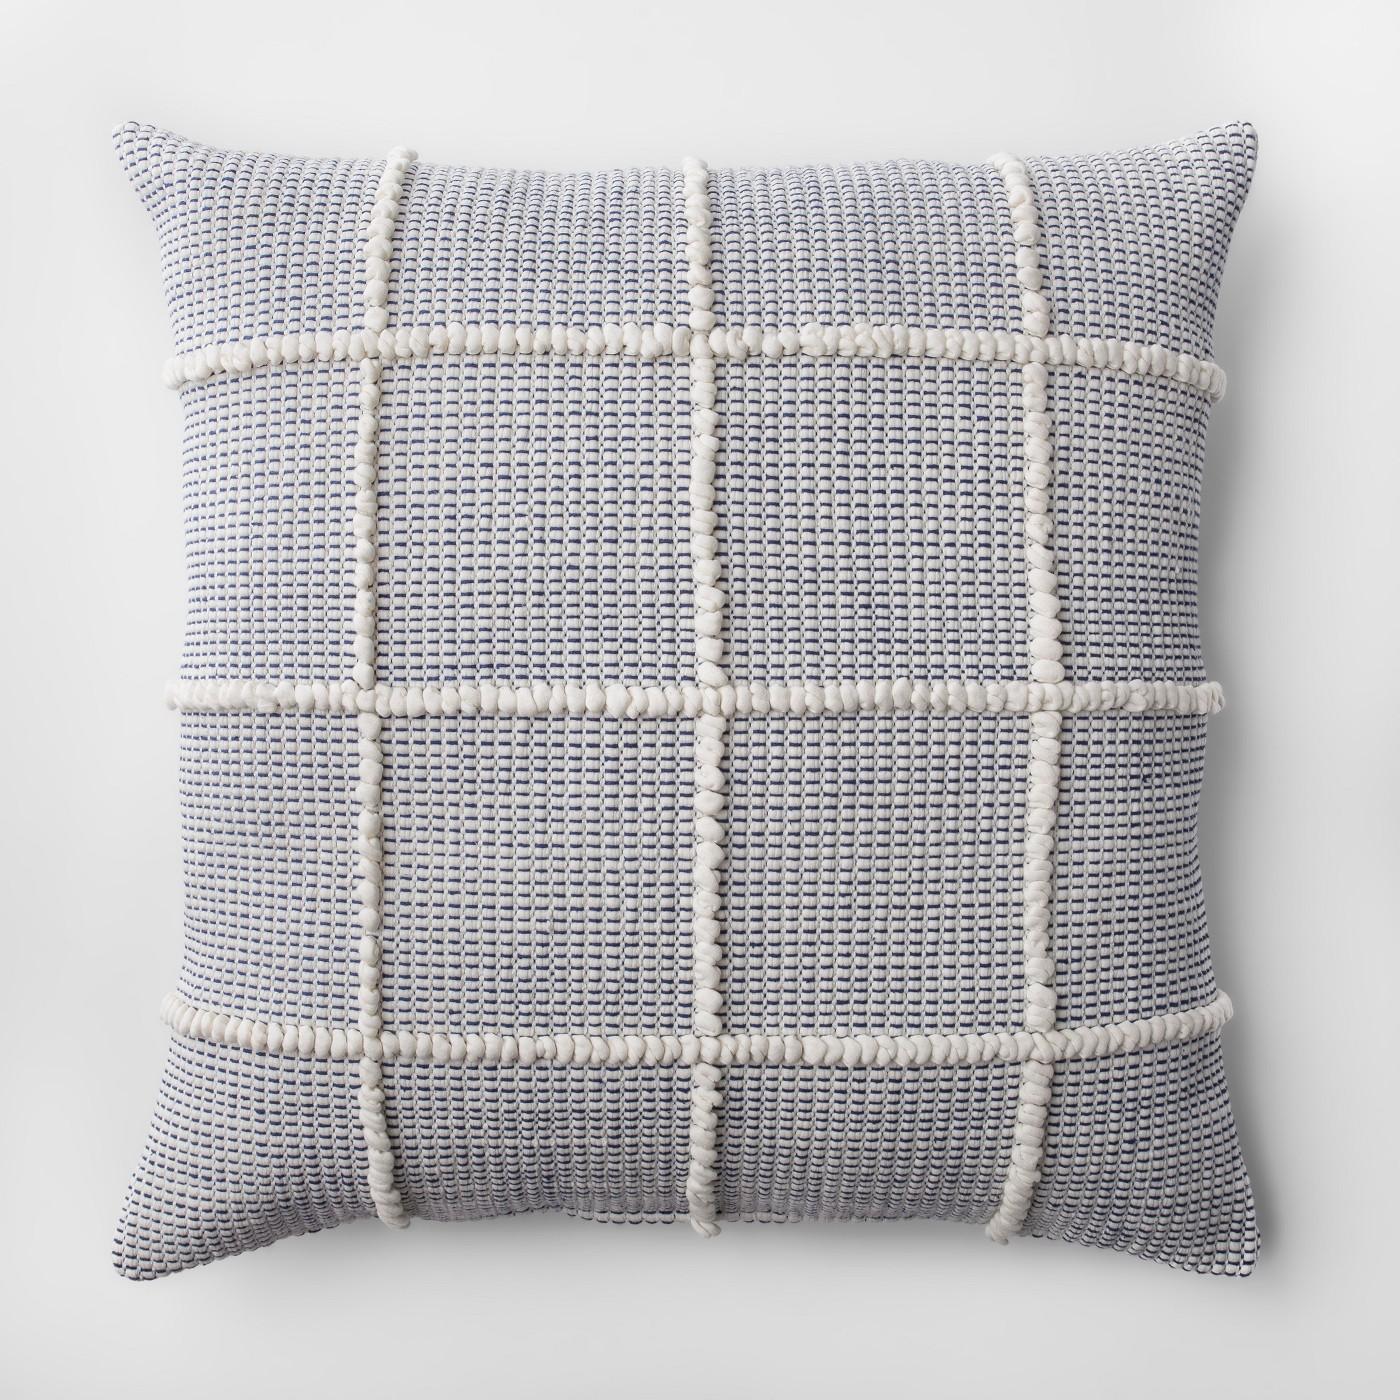 oversized-throw-pillow.jpg